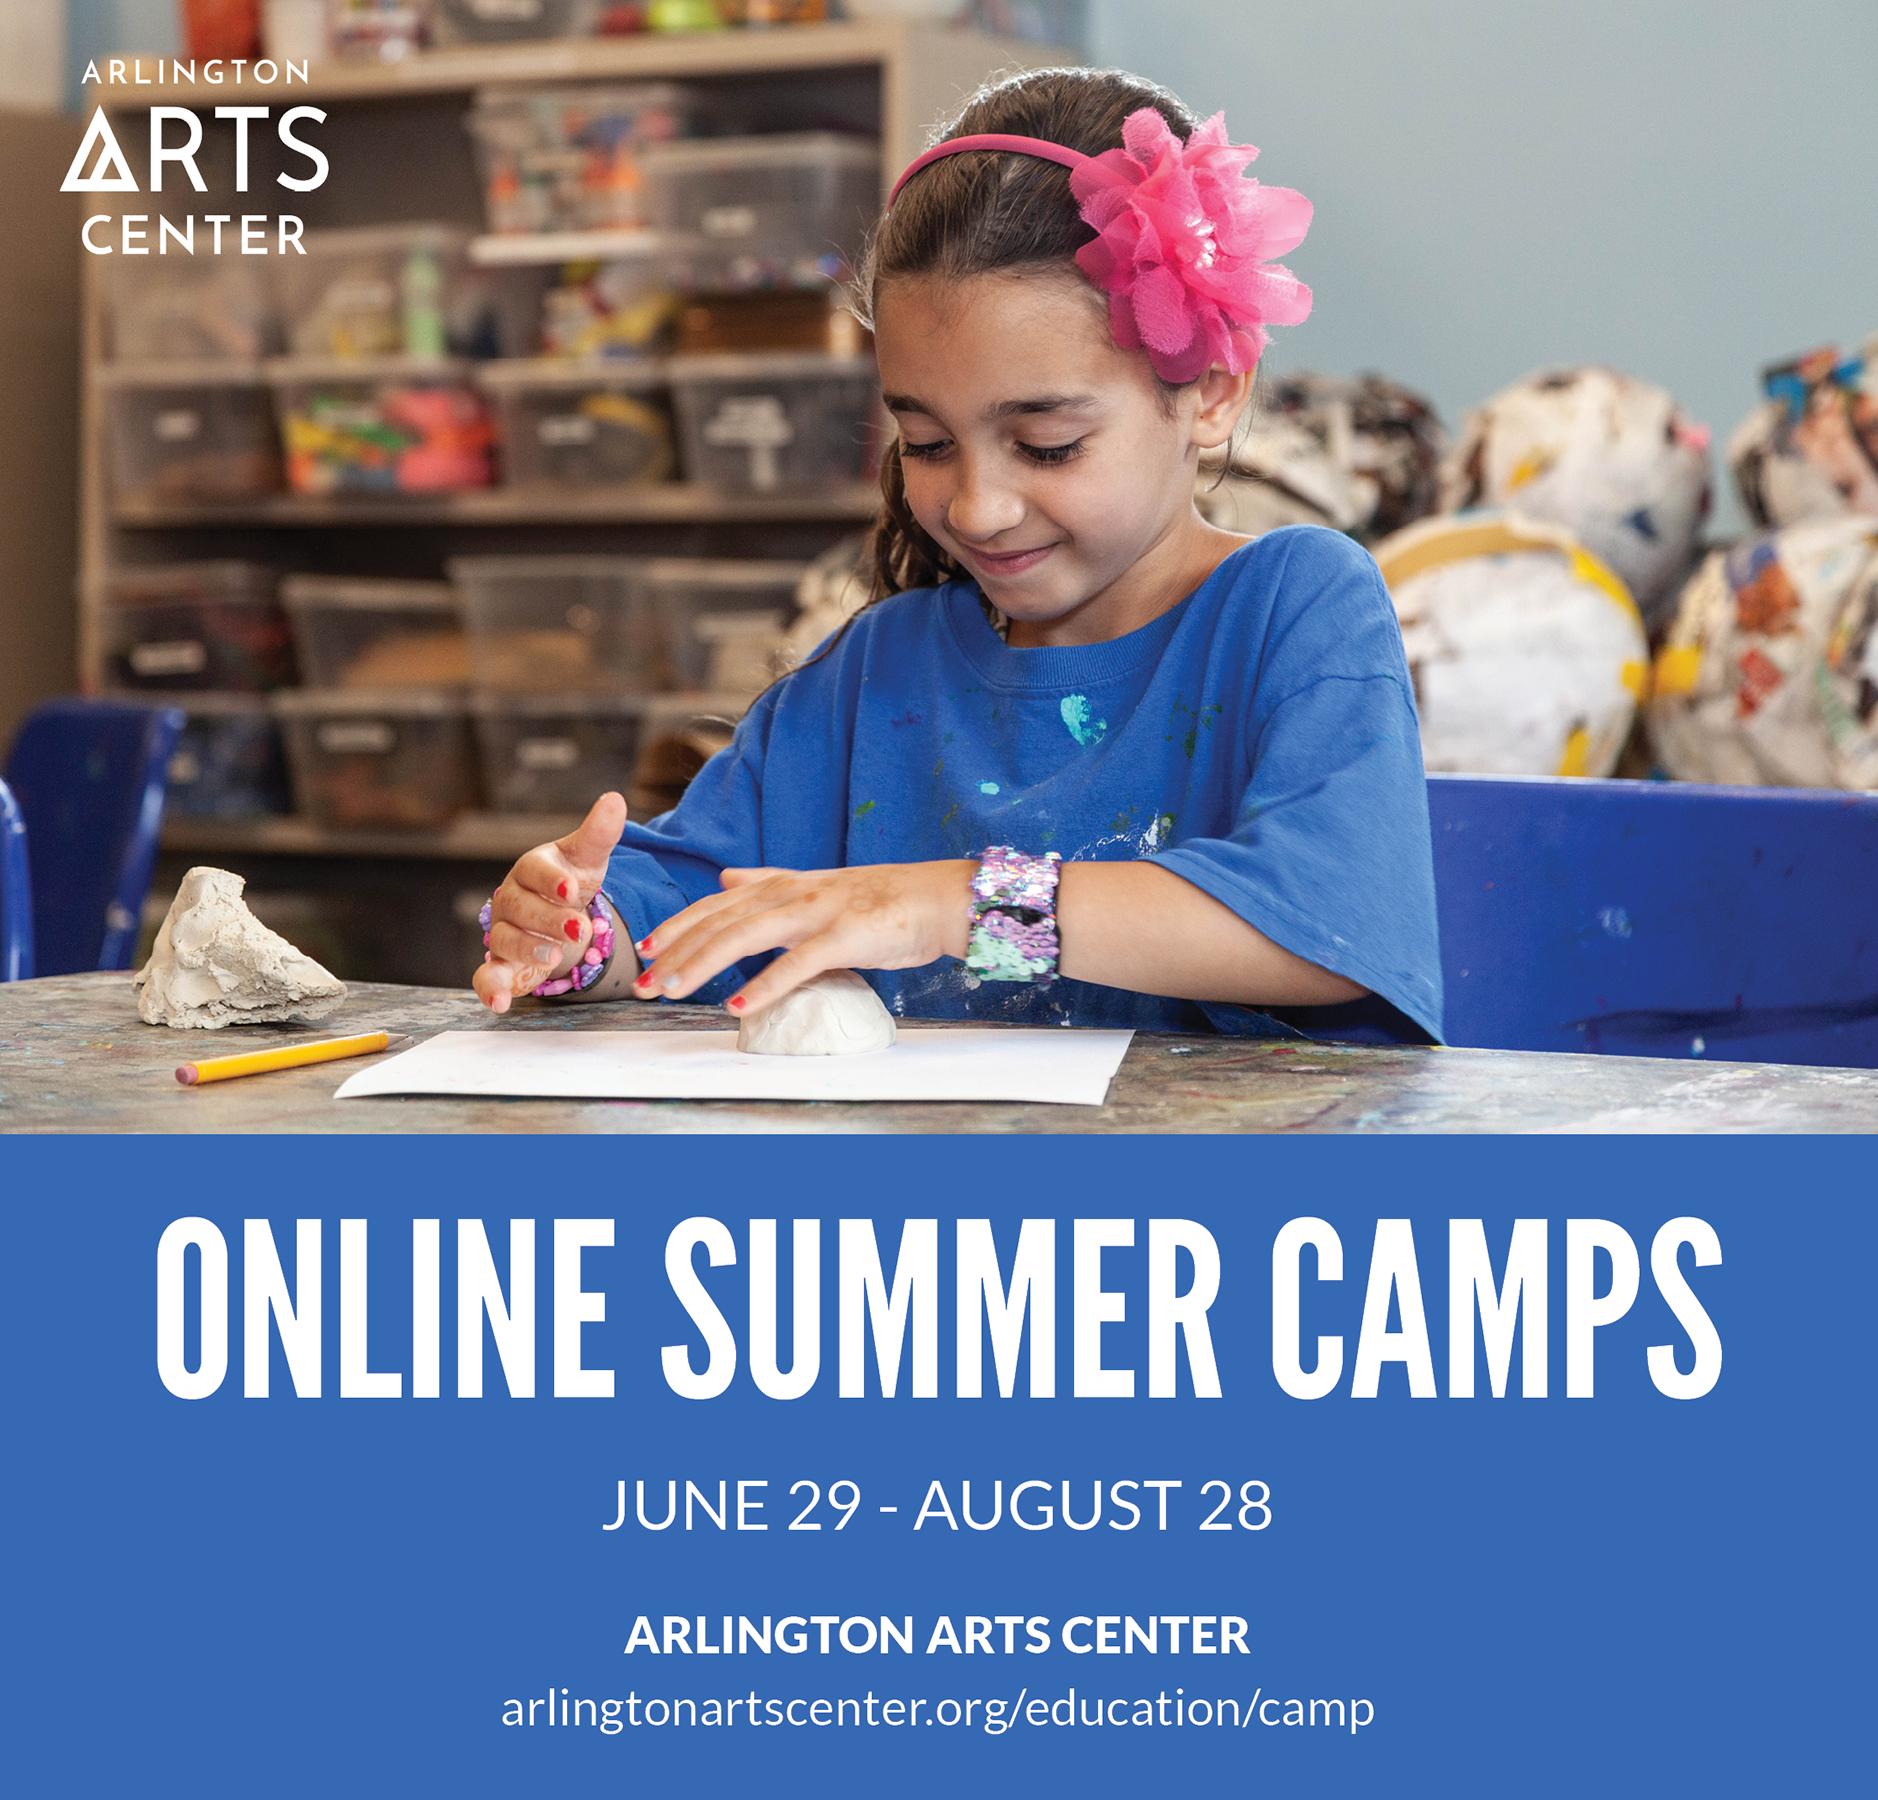 Online Summer Camps at Arlington Arts Center